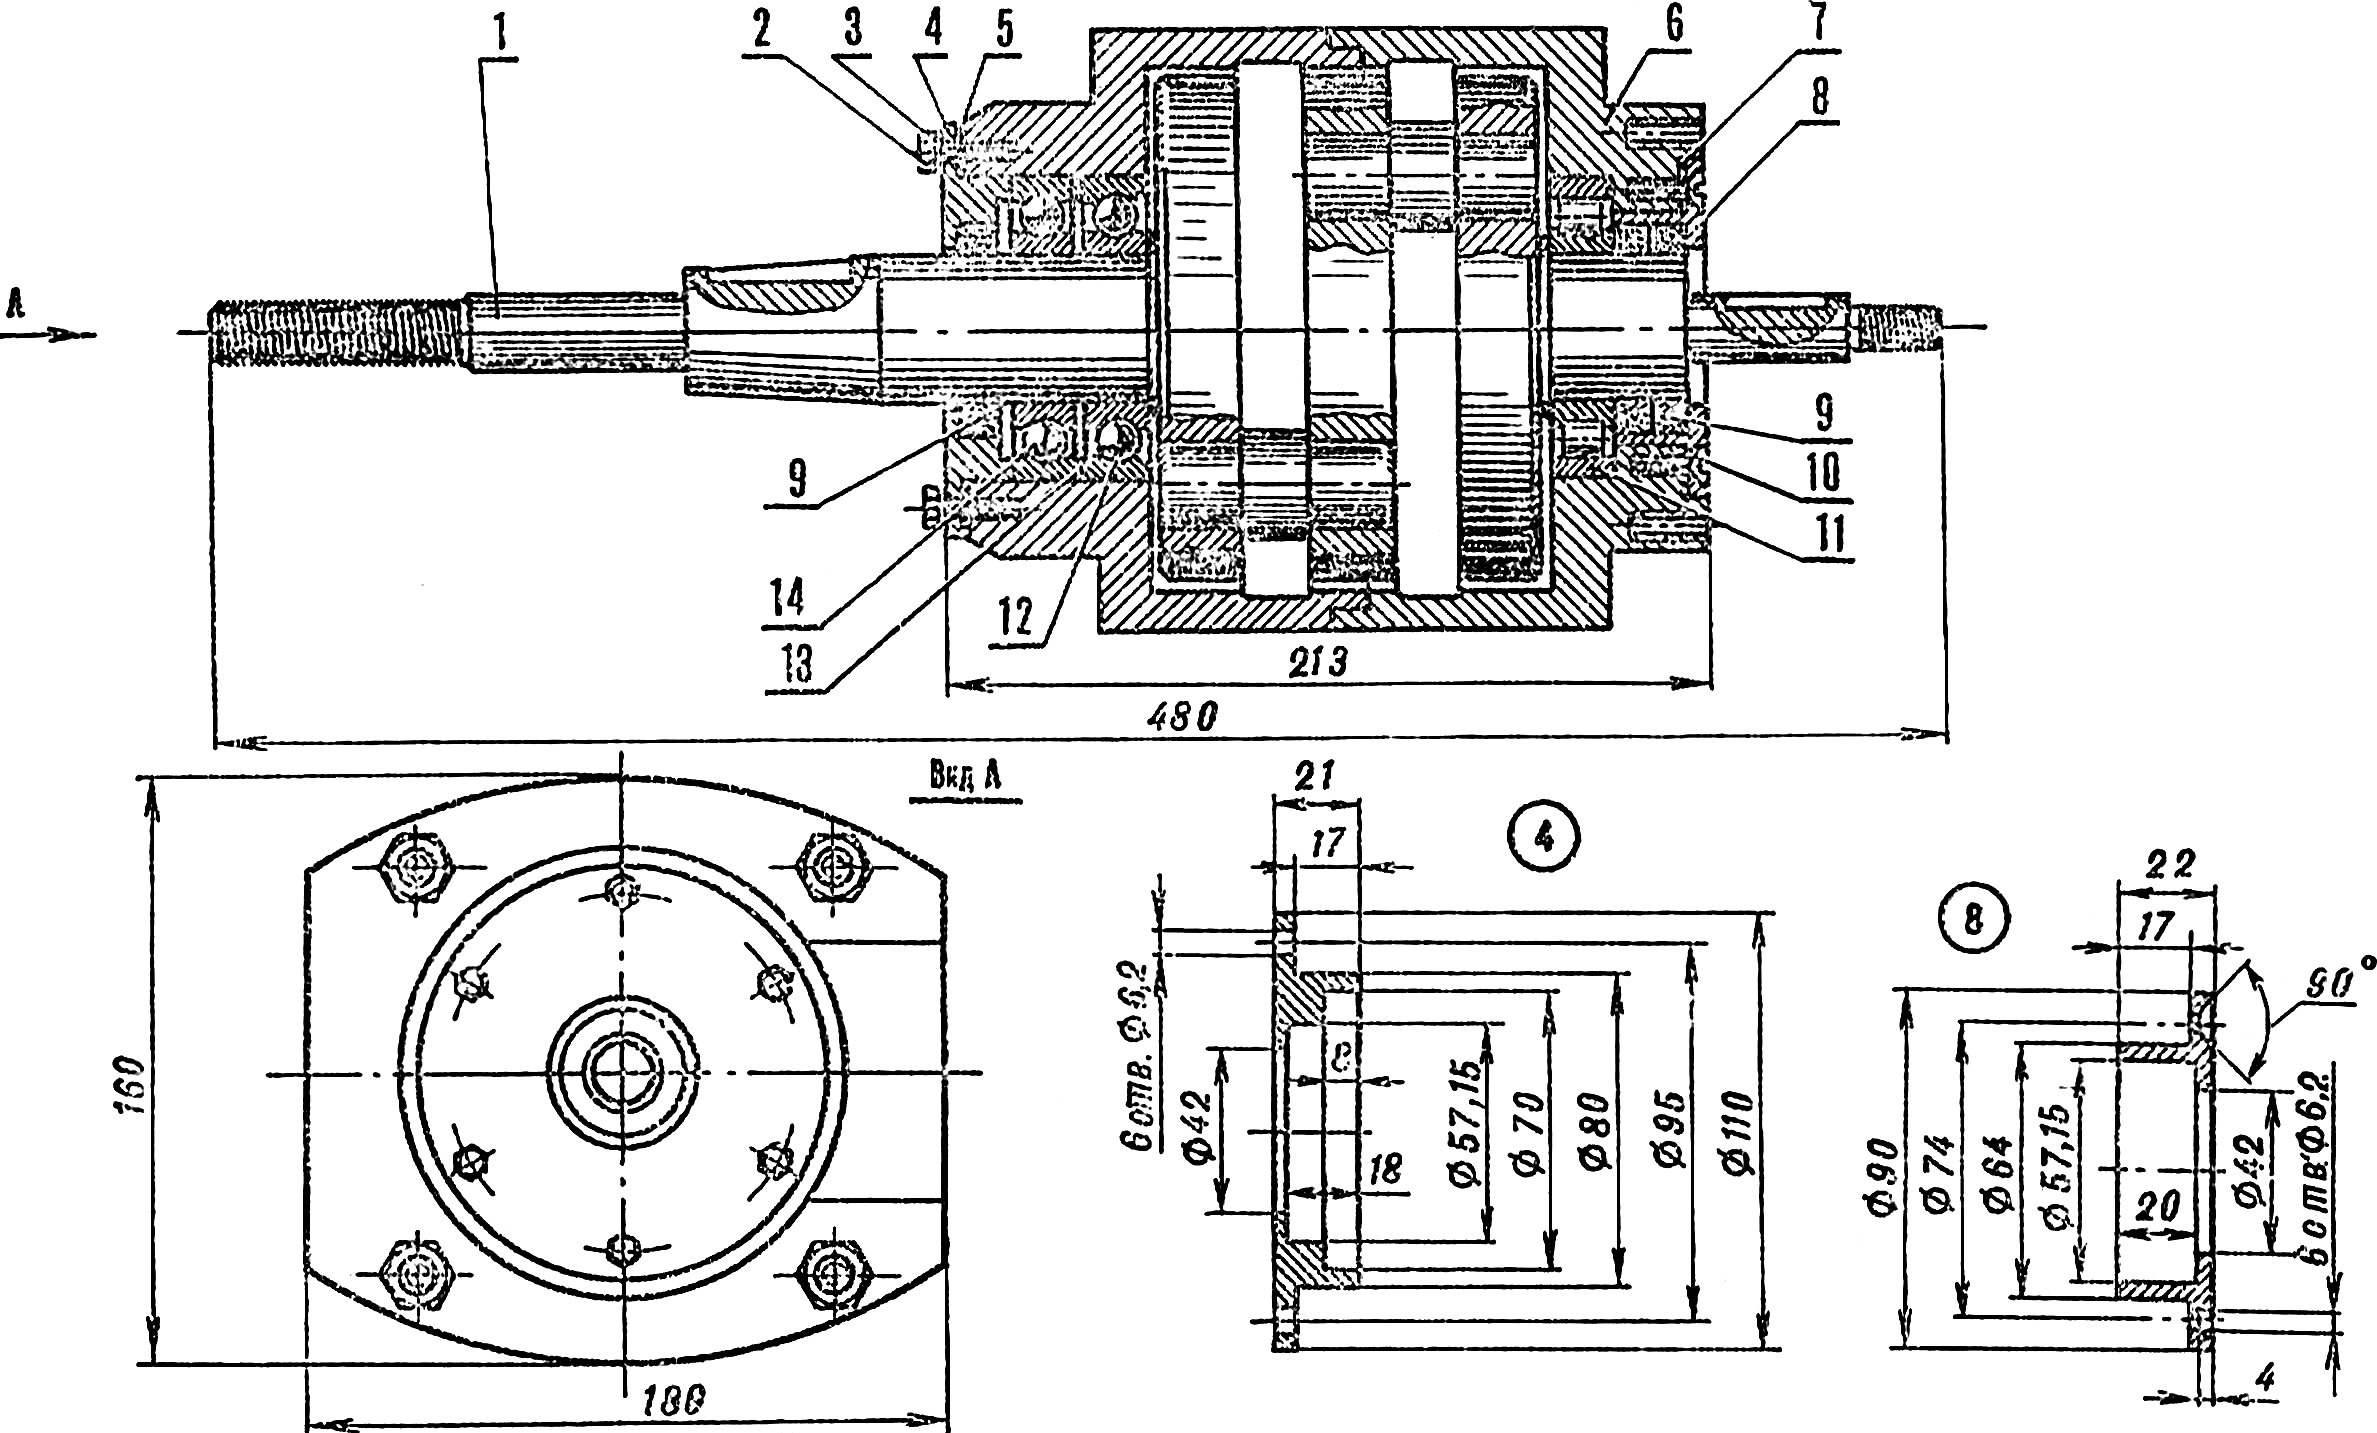 Рис. 1. Блок «вал-картер» двухцилиндрового оппозитного двигателя ДД-700/40.